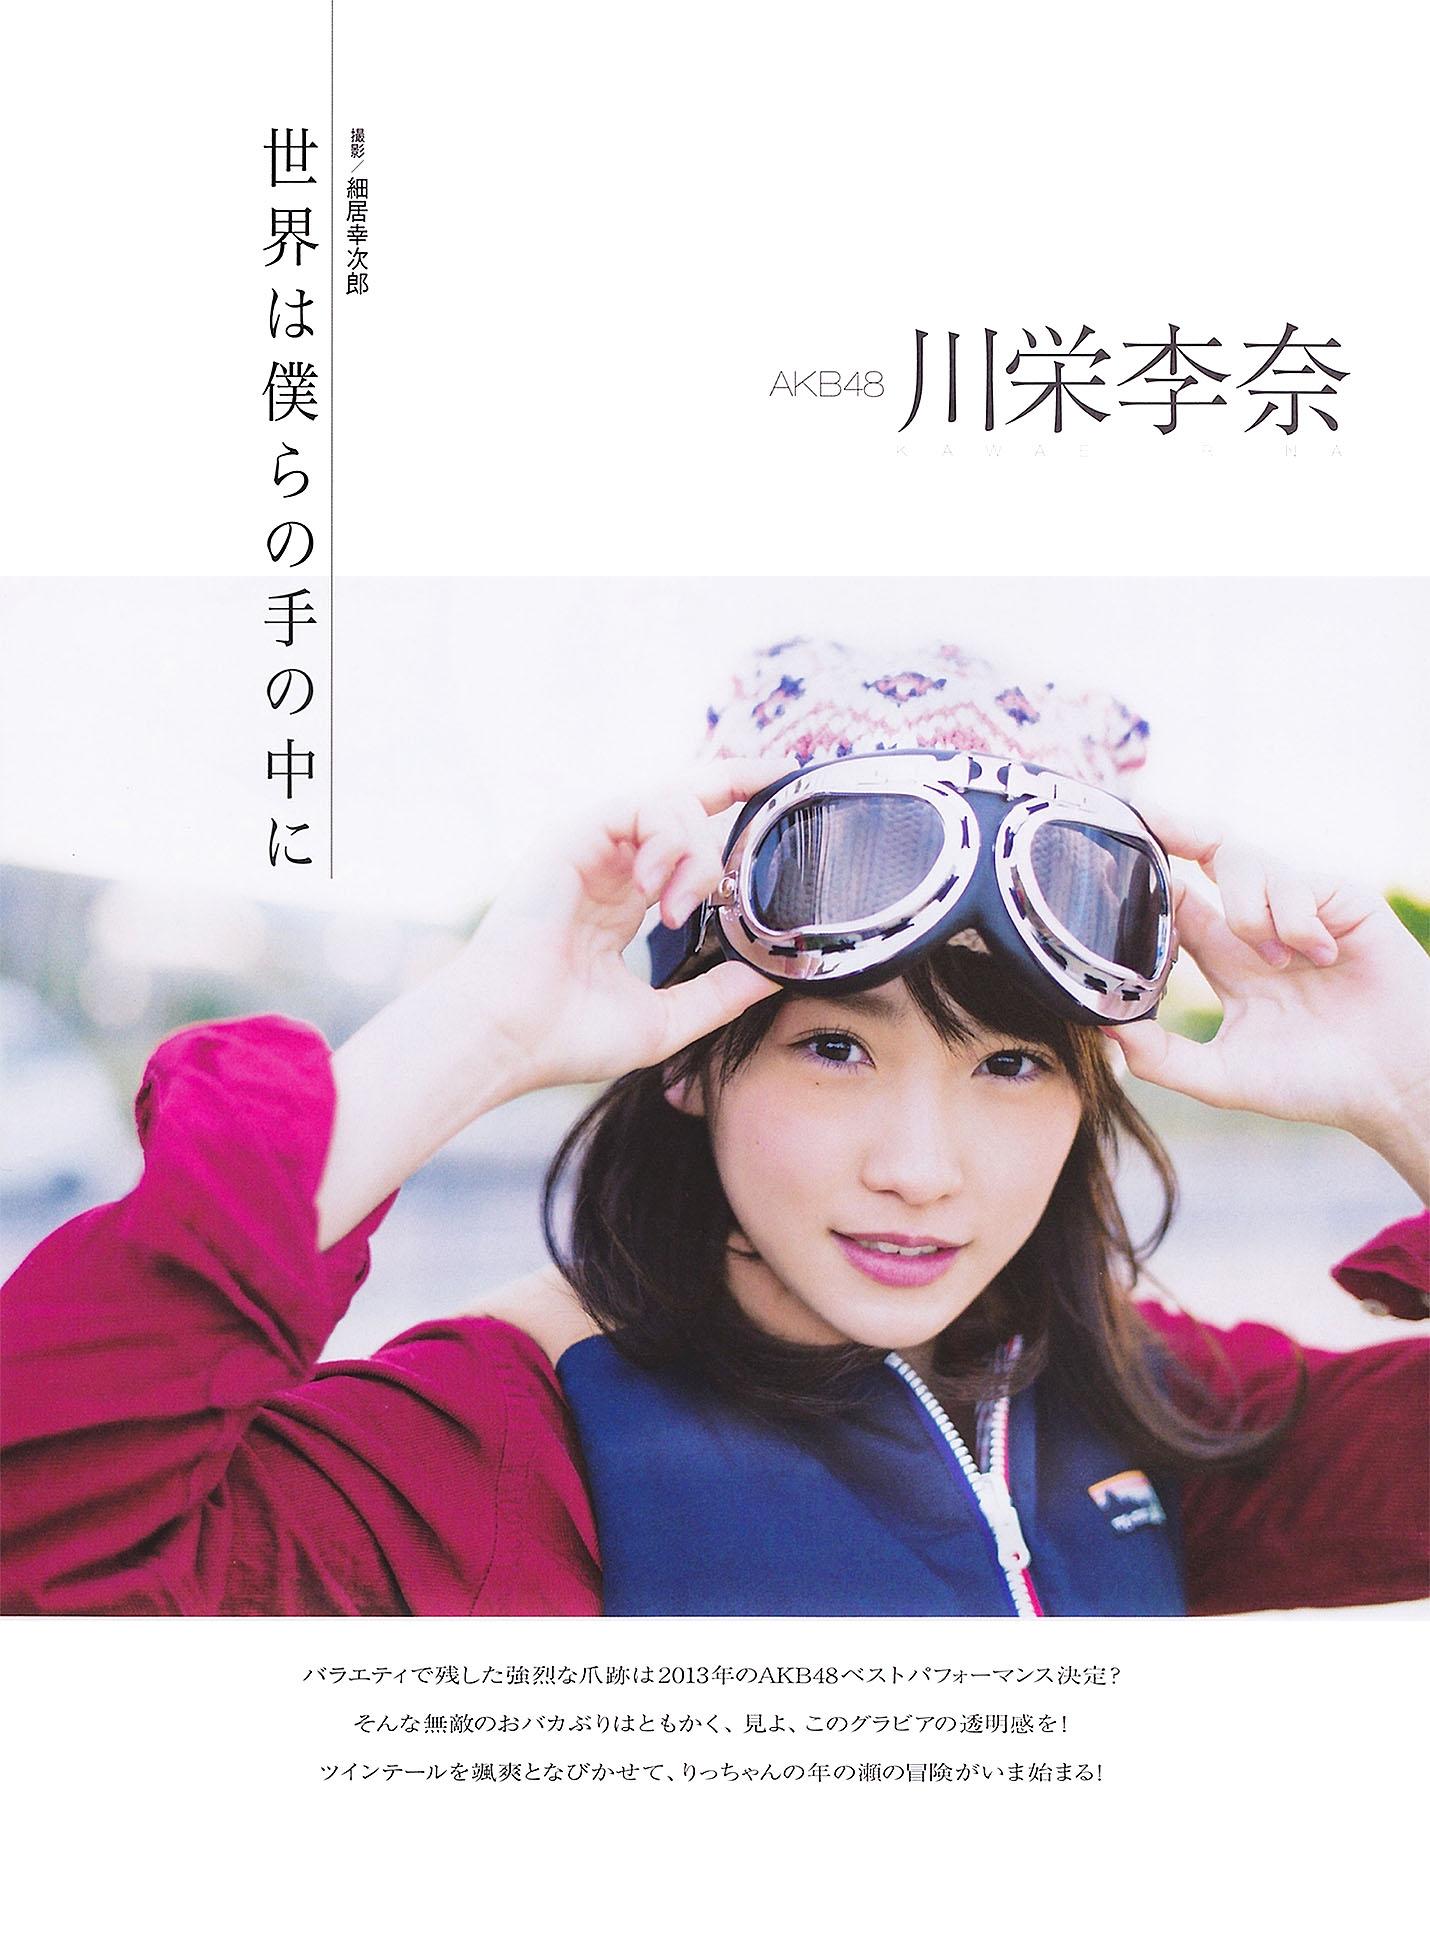 RKawaei EnTame 1402 01.jpg